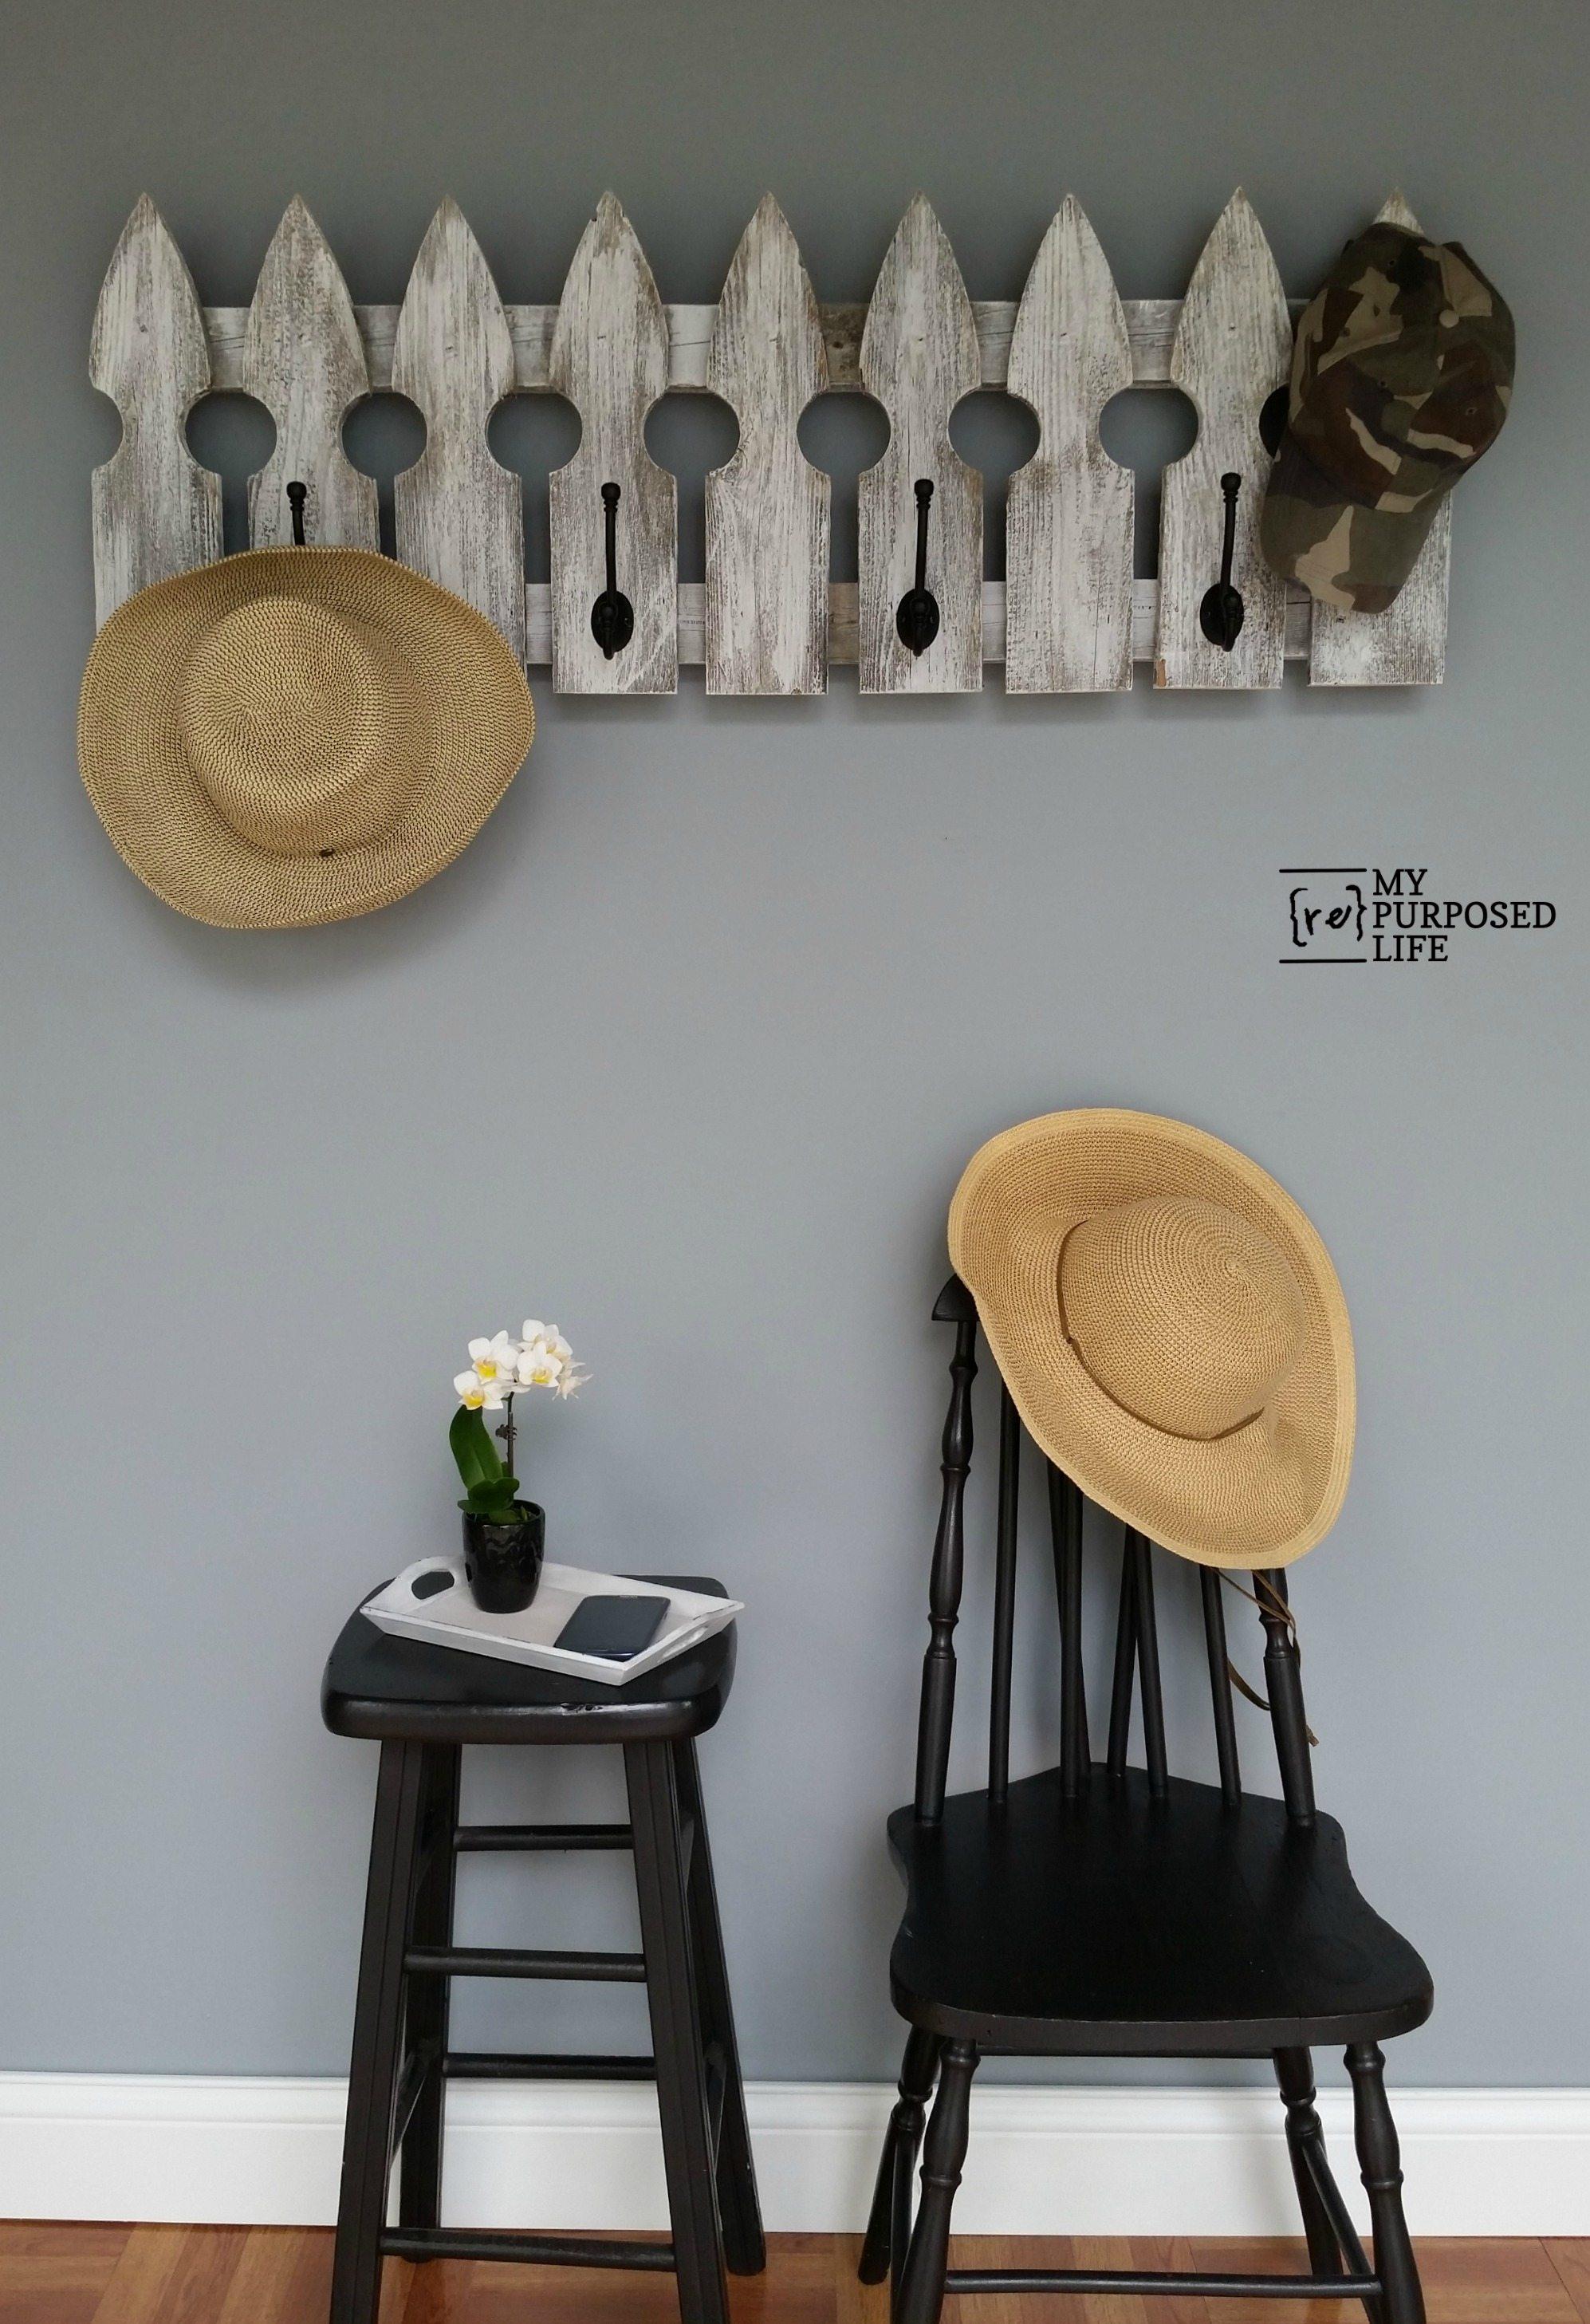 Picket Fence Coat Rack My Repurposed Life